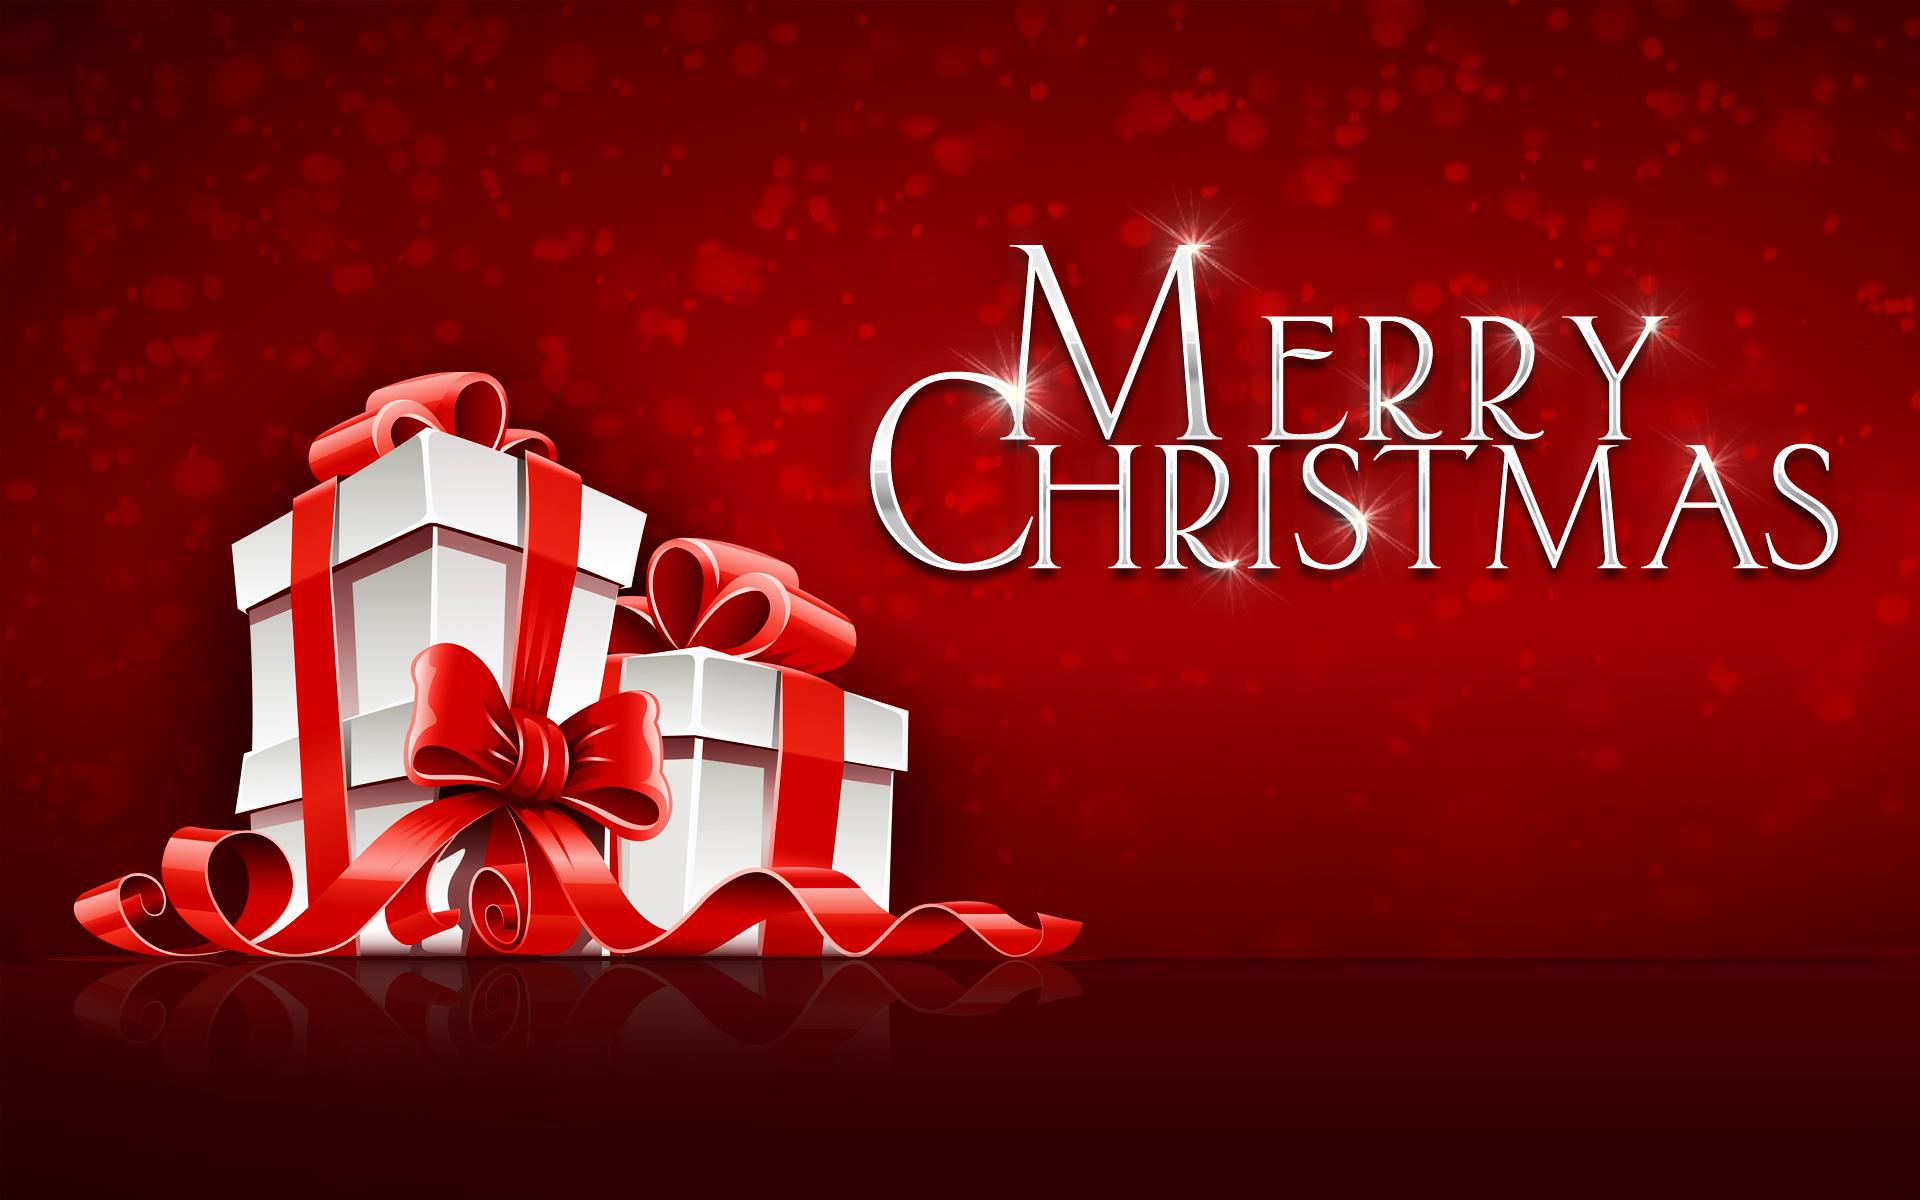 Merry Christman